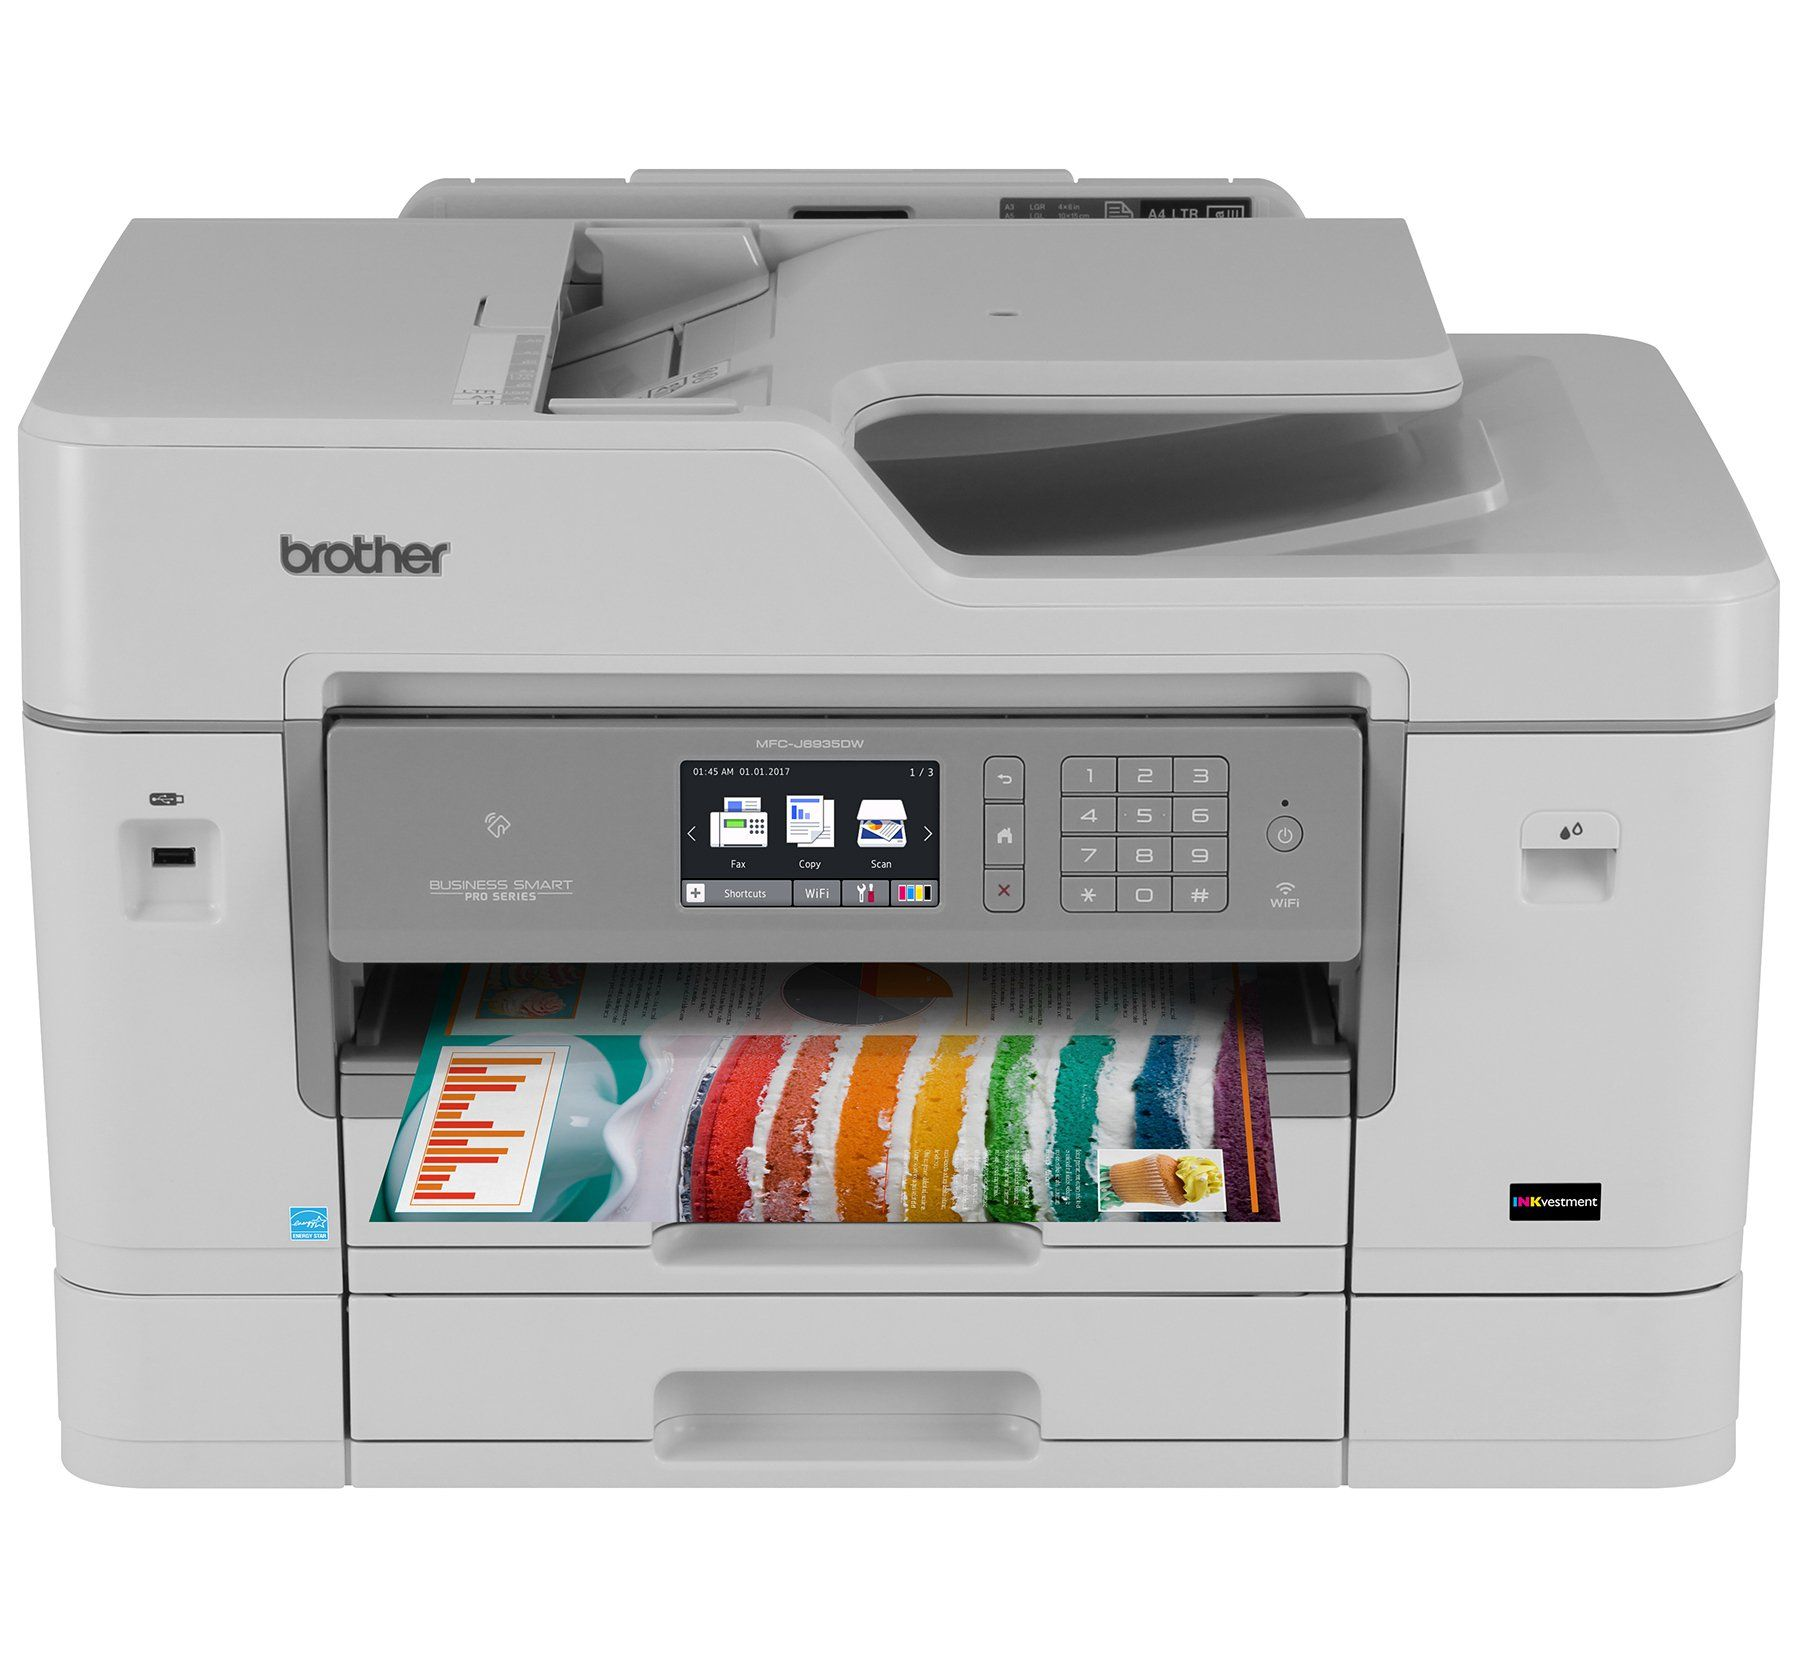 Color printer wireless - Brother Printer Mfcj6935dw Wireless Color Printer With Scanner Copier Fax